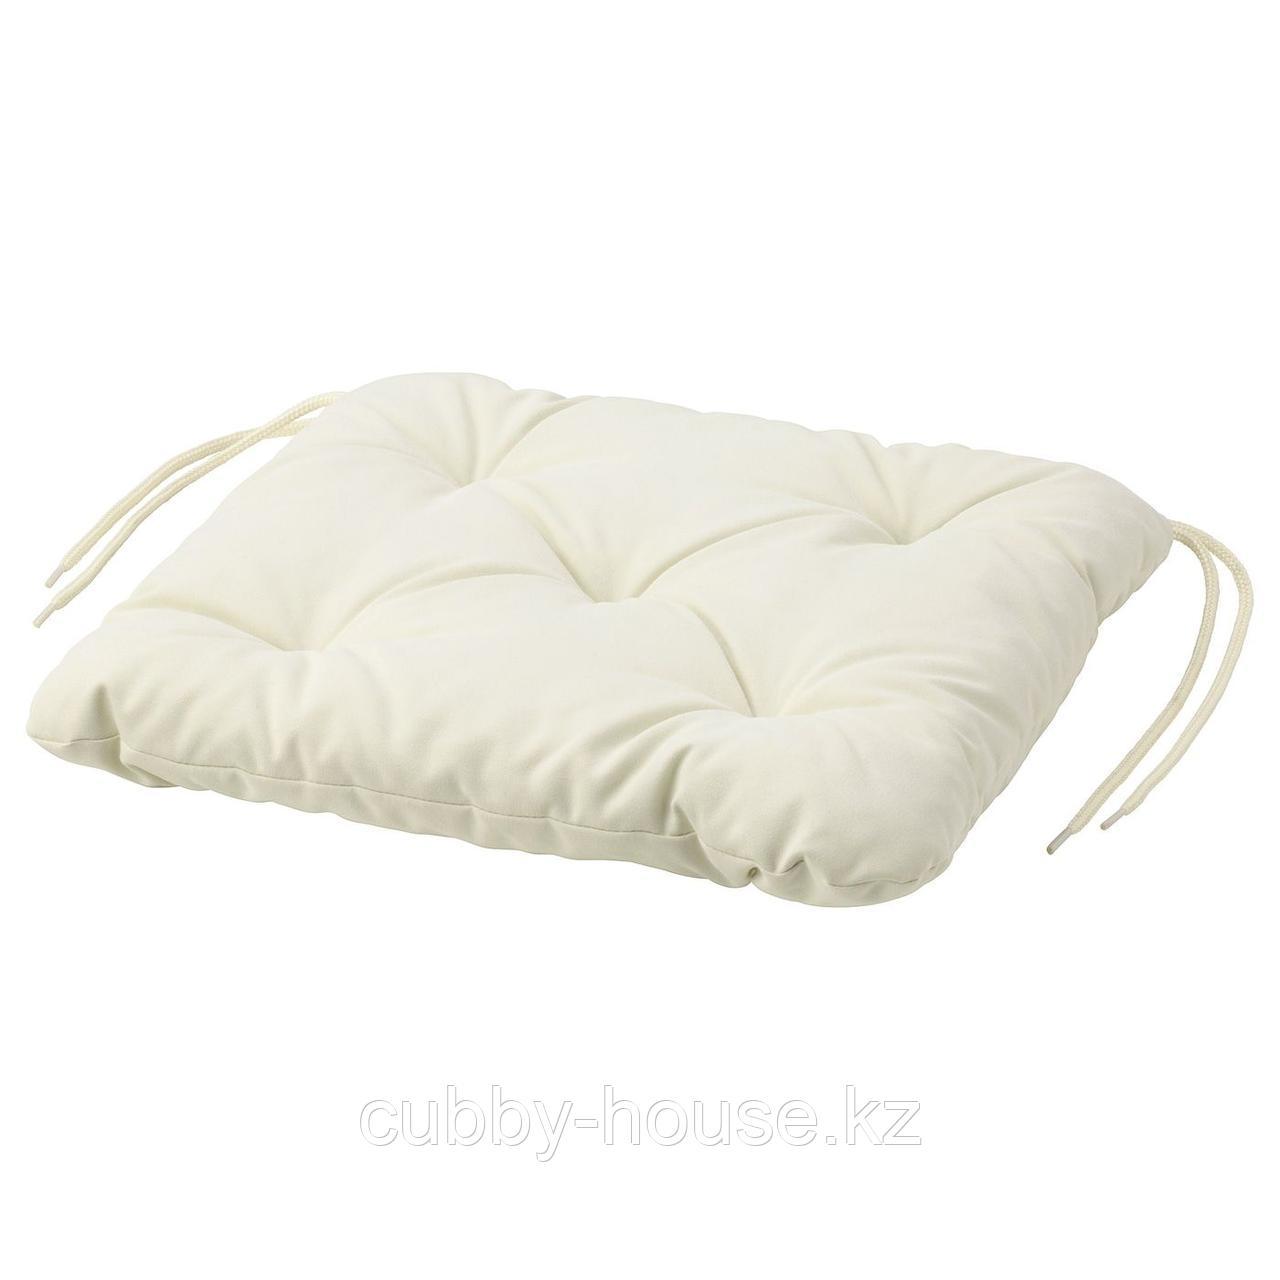 КУДДАРНА Подушка на садовый стул, серый, 36x32 см